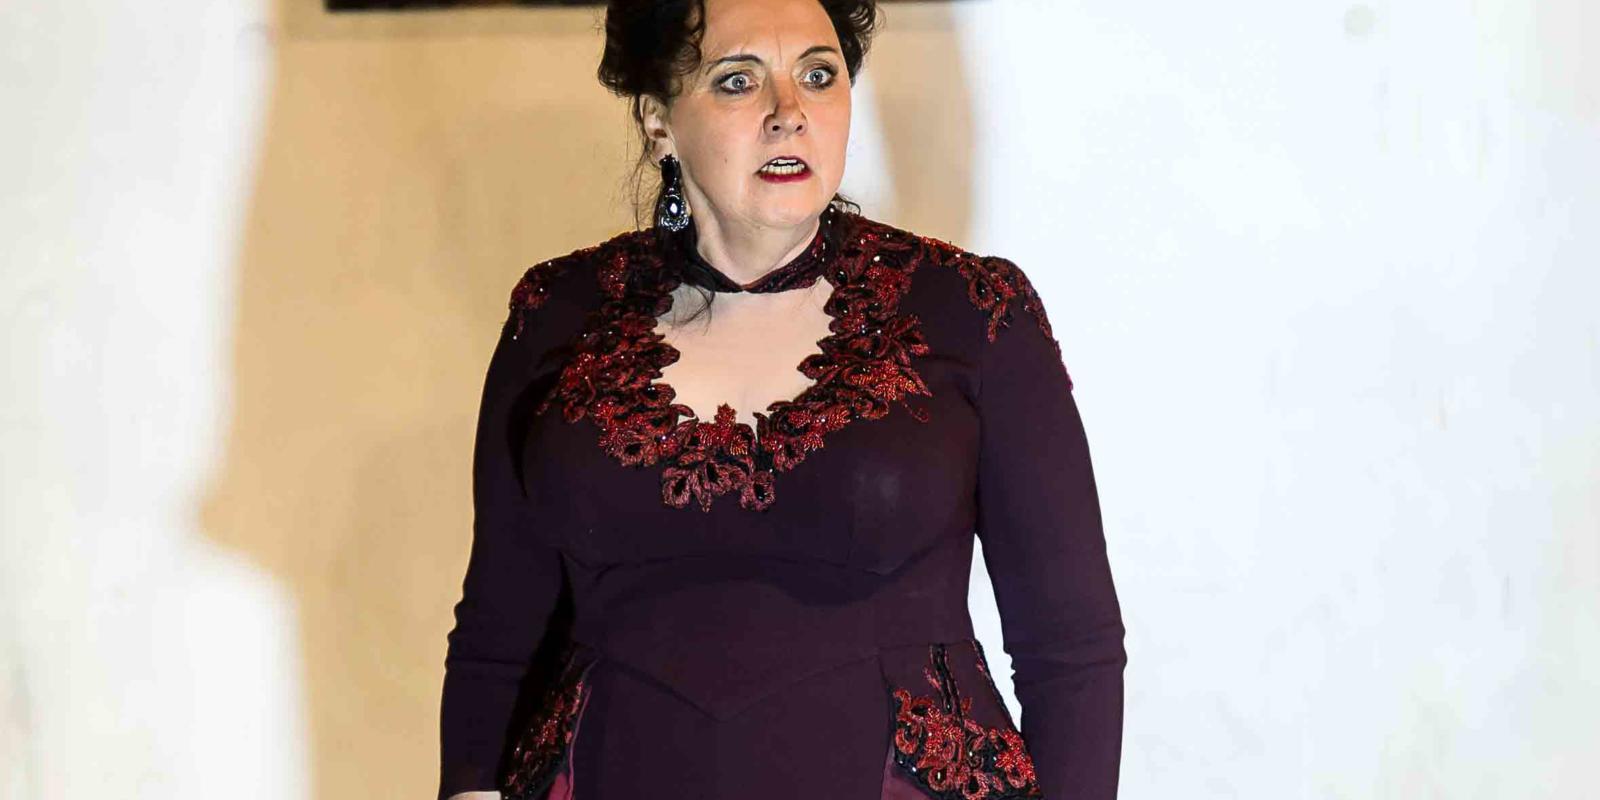 An image of Susan Bickley in Richard Jones's 2014 production of Rodelinda